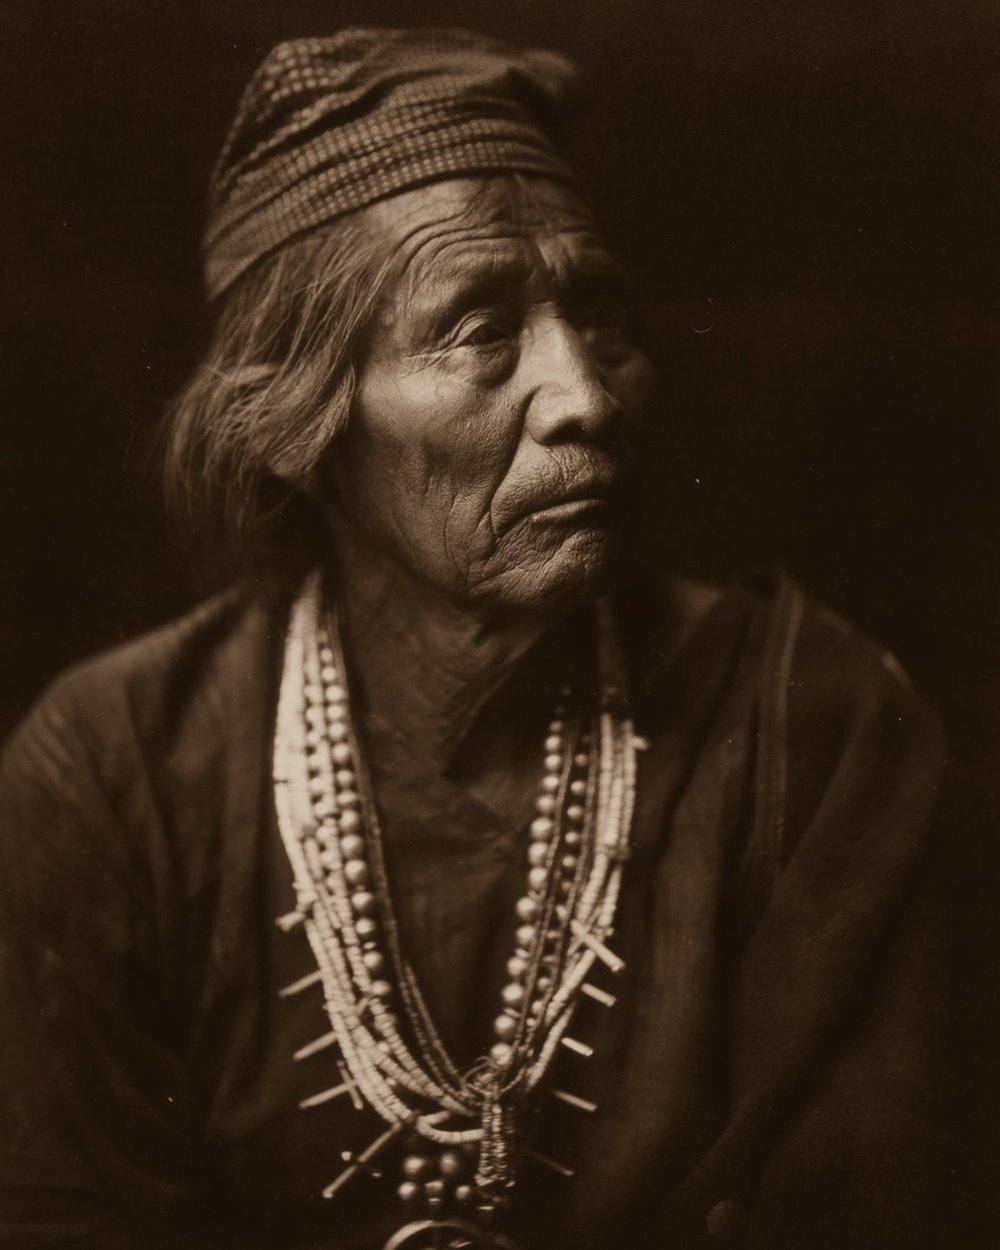 Nesjaja Hatali, Navajo medicine man,  1904.  ©EDWARD S. CURTIS/LIBRARY OF CONGRESS